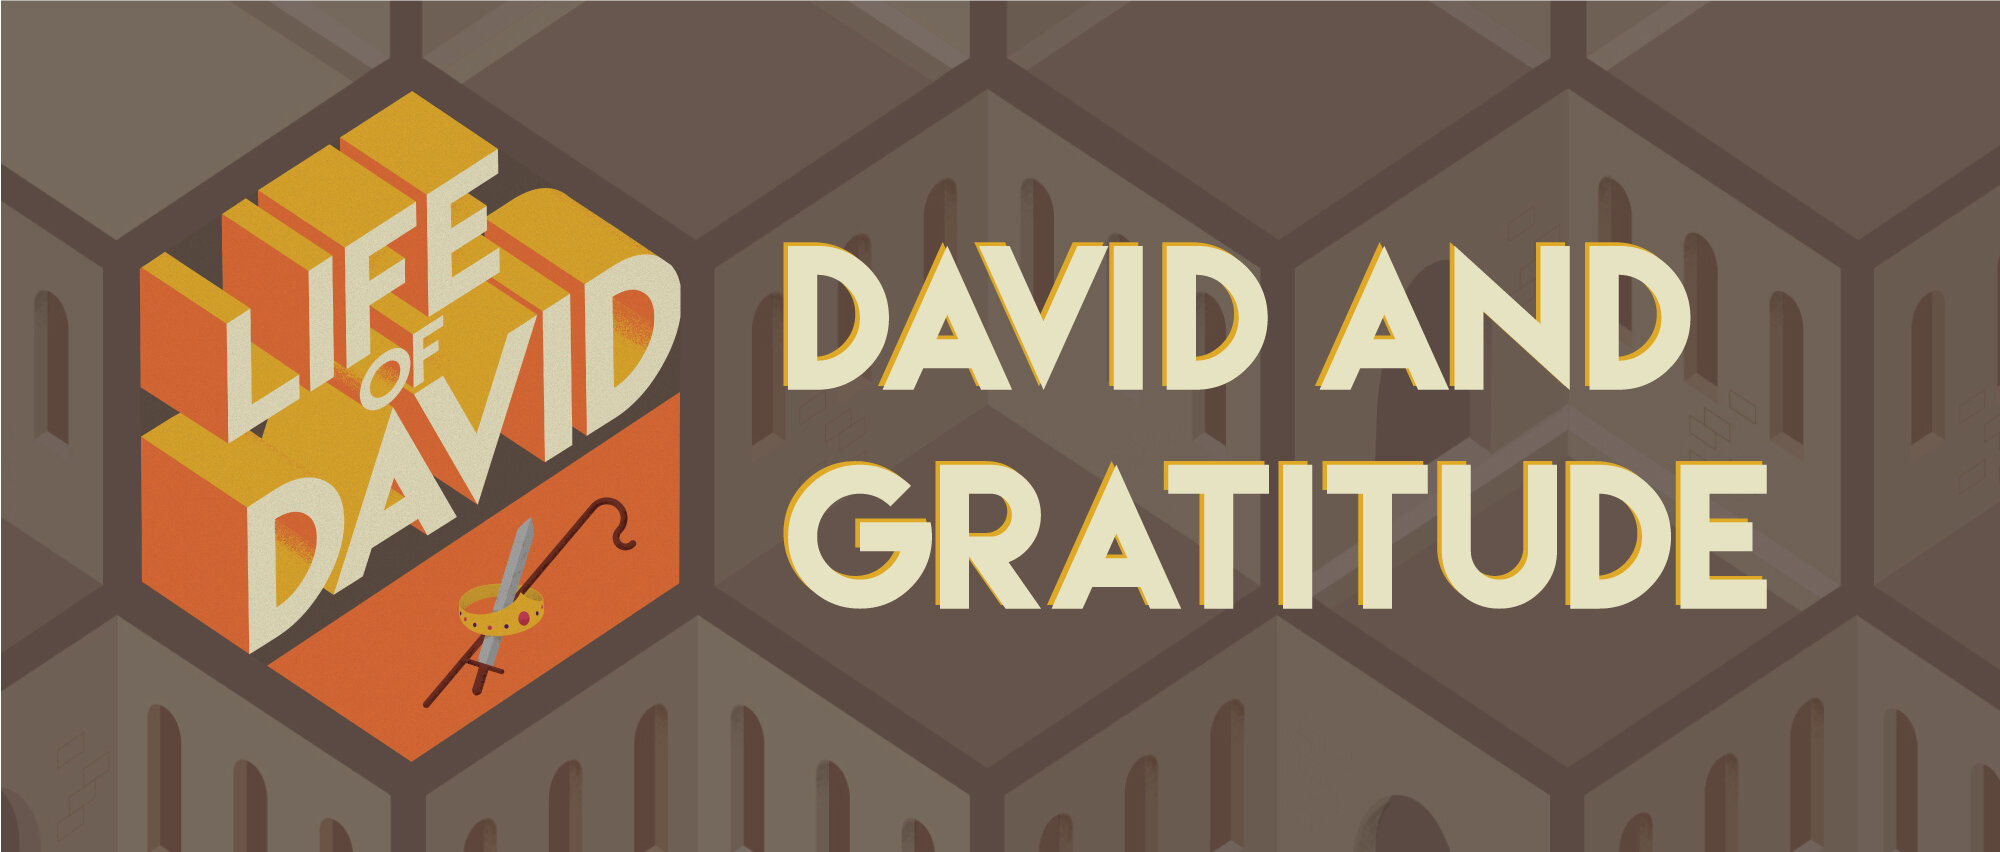 David-and-Gratitude.jpg